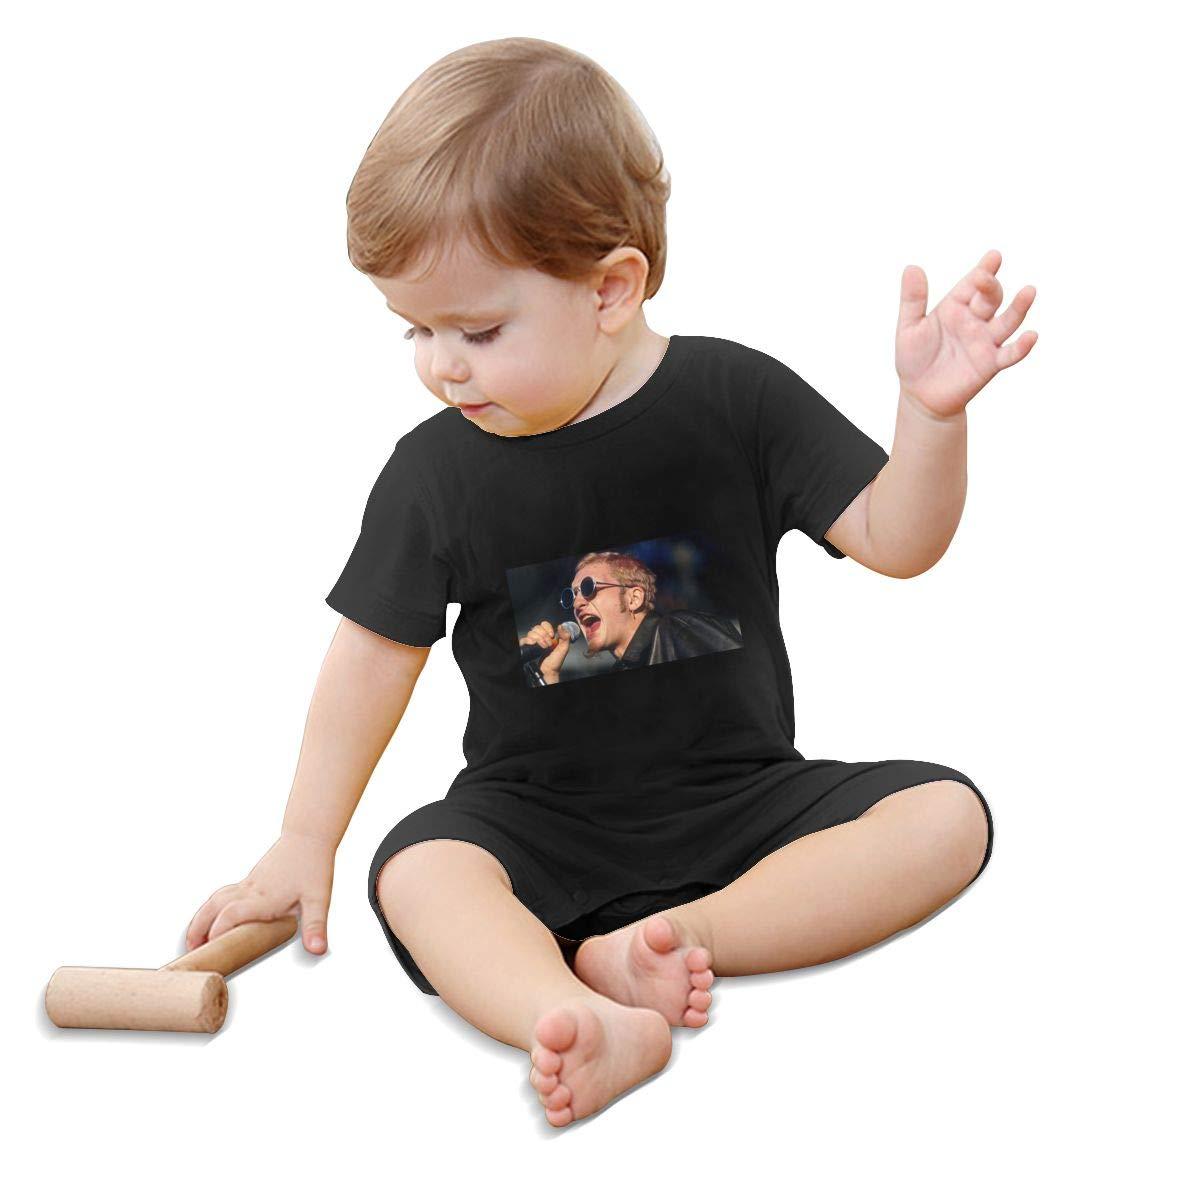 WangSiwe Layne Staley Infant Boy Girl Short Sleeve Jumpsuit Summer Outfits